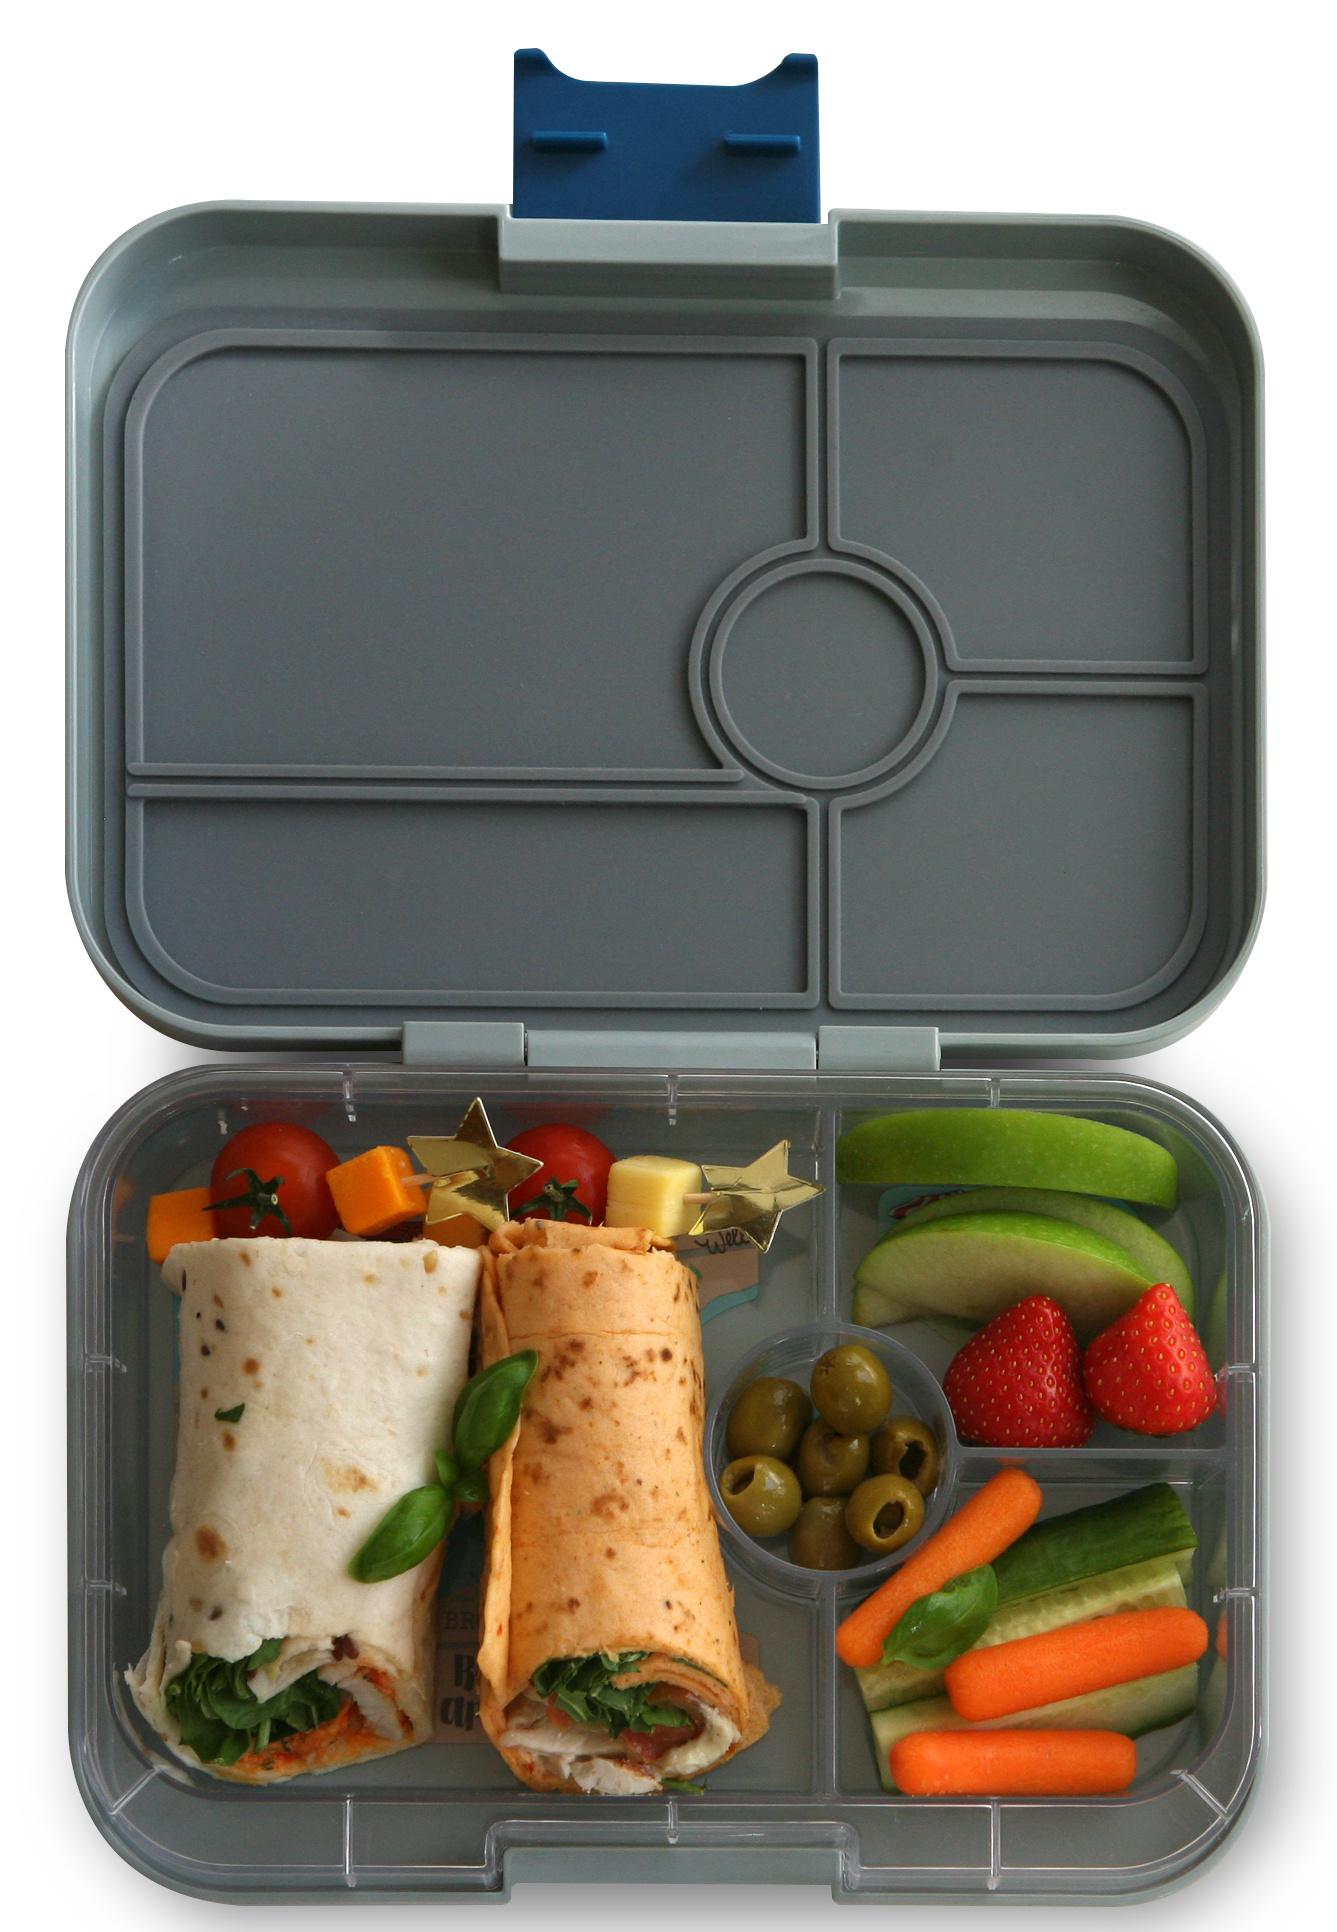 Yumbox Tapas XL lunchtrommel Flat Iron grijs / transparante tray 4 vakken-2